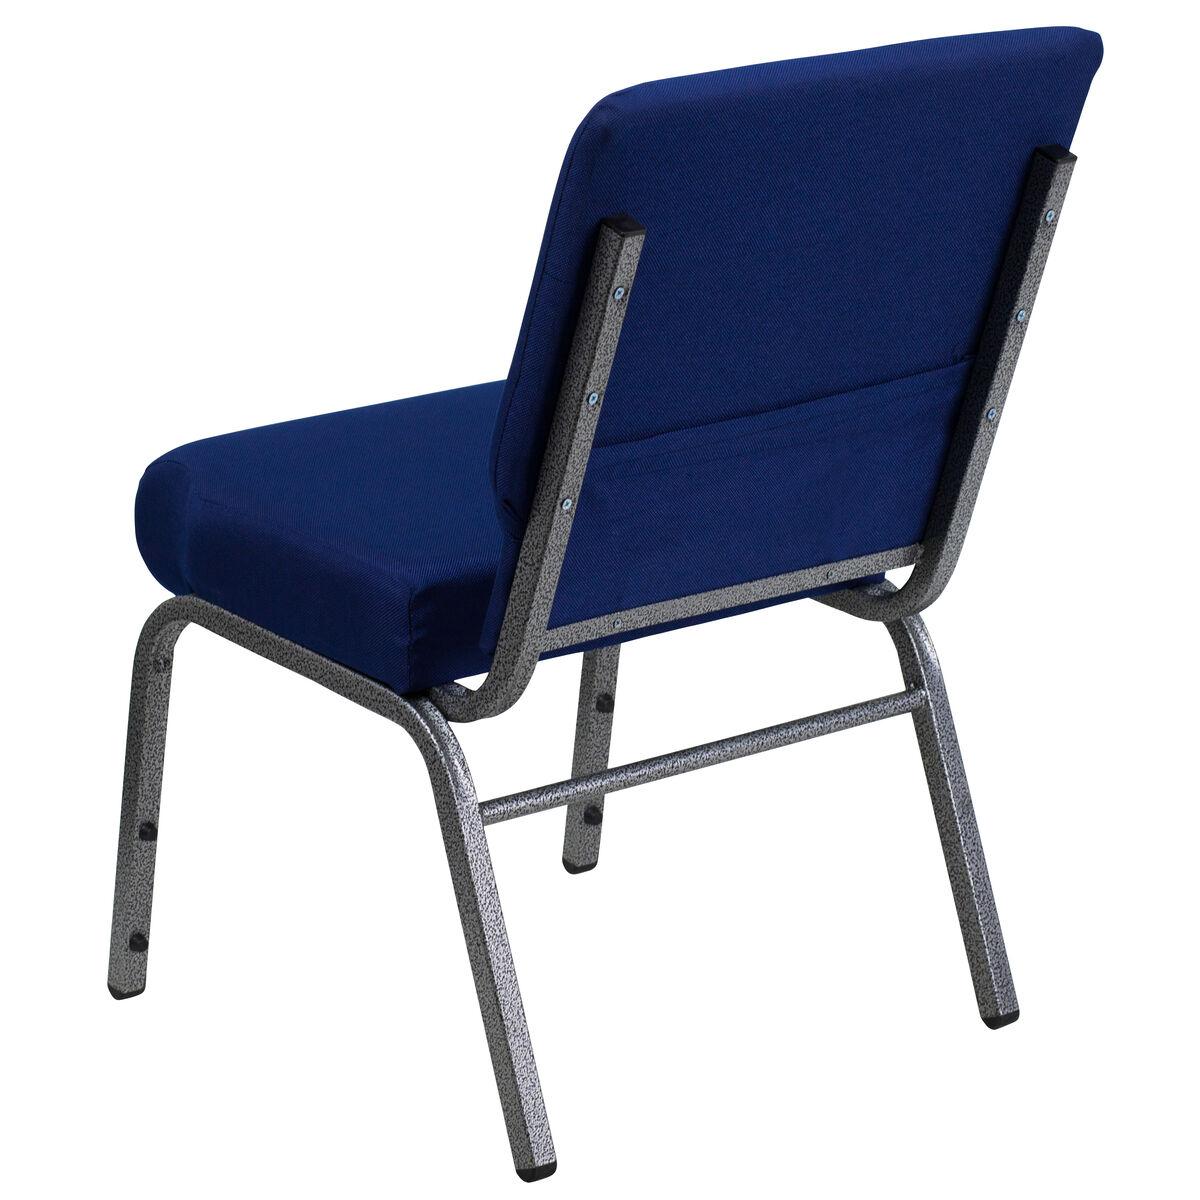 navy blue fabric church chair fd ch0221 4 sv nb24 gg On furniture 4 less